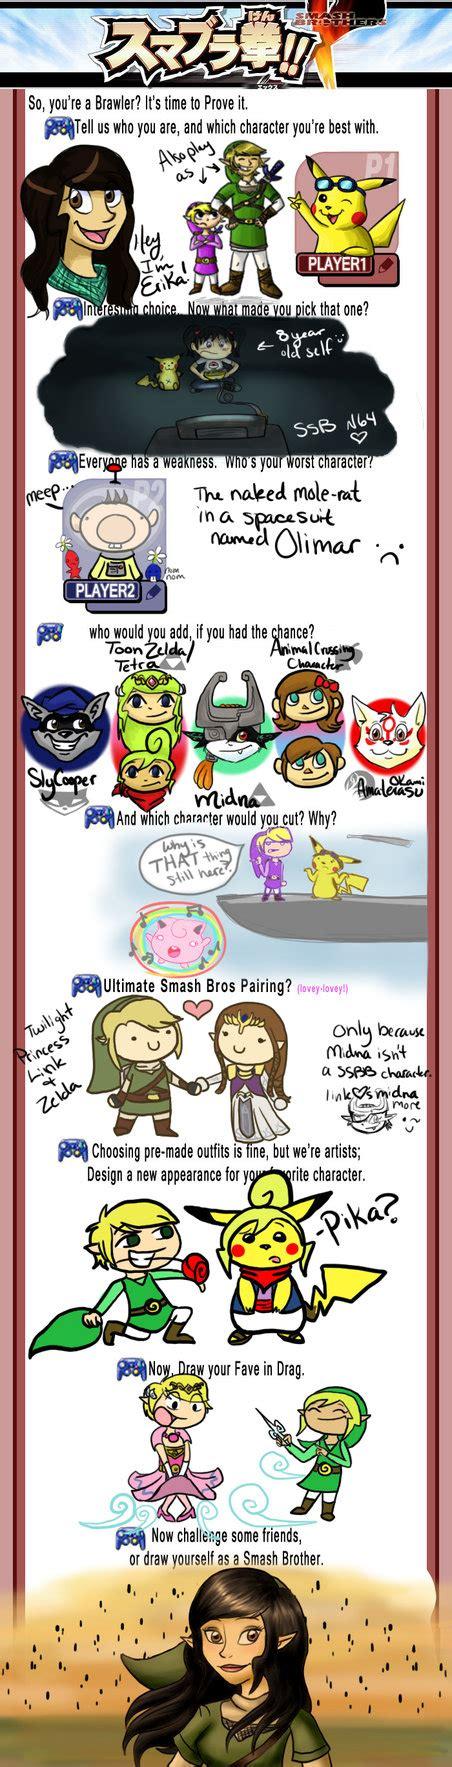 Smash Bros Memes - super smash bros brawl meme by erikathegoober on deviantart